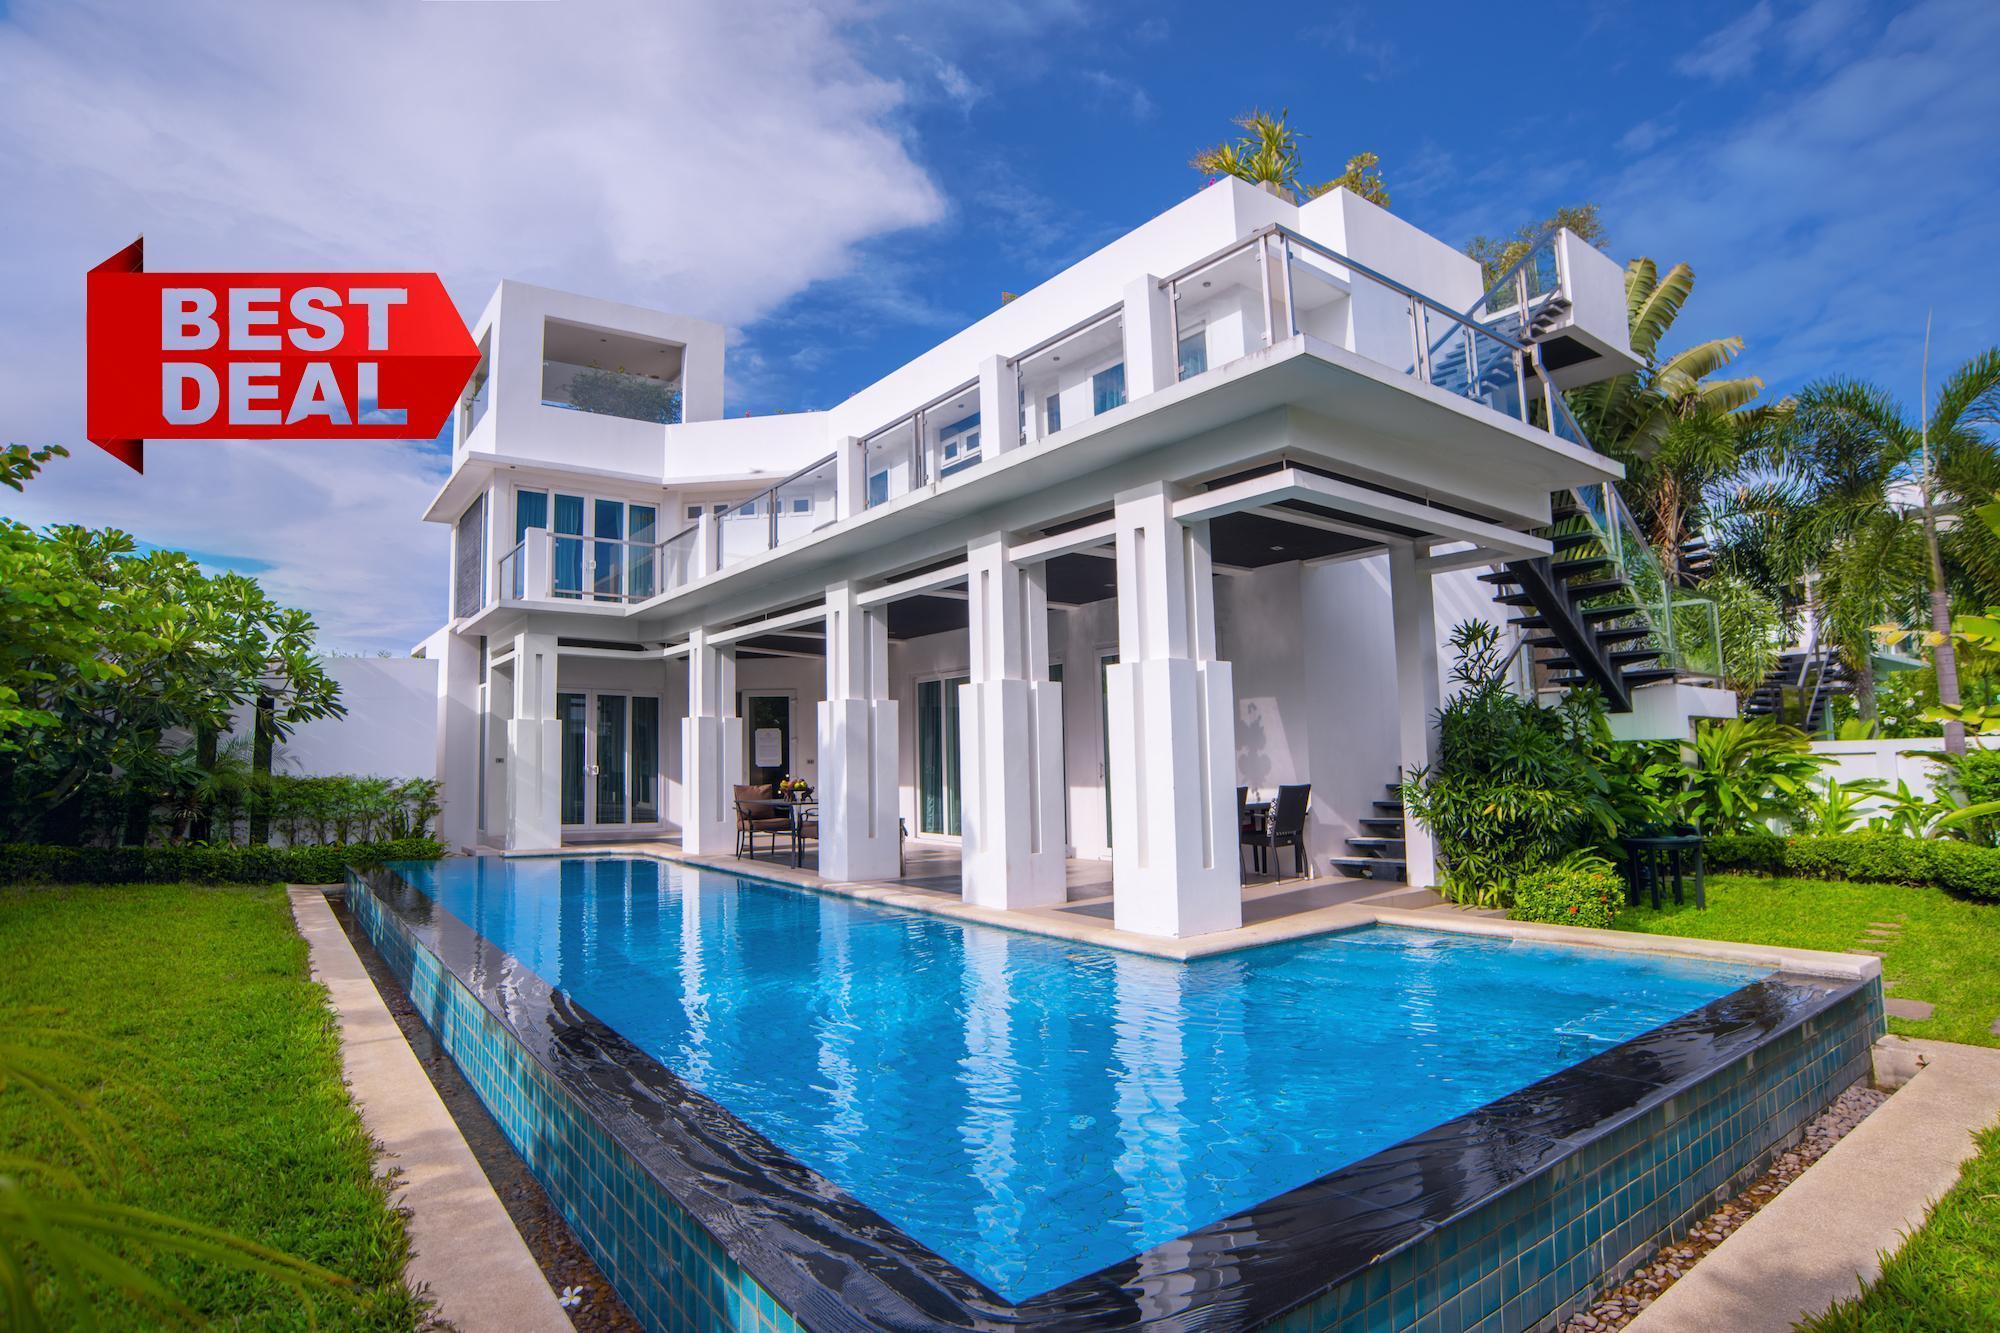 LUXURY Pool Villa Pattaya 4 bedroom, Palm Oasis วิลลา 4 ห้องนอน 4 ห้องน้ำส่วนตัว ขนาด 530 ตร.ม. – หาดจอมเทียน